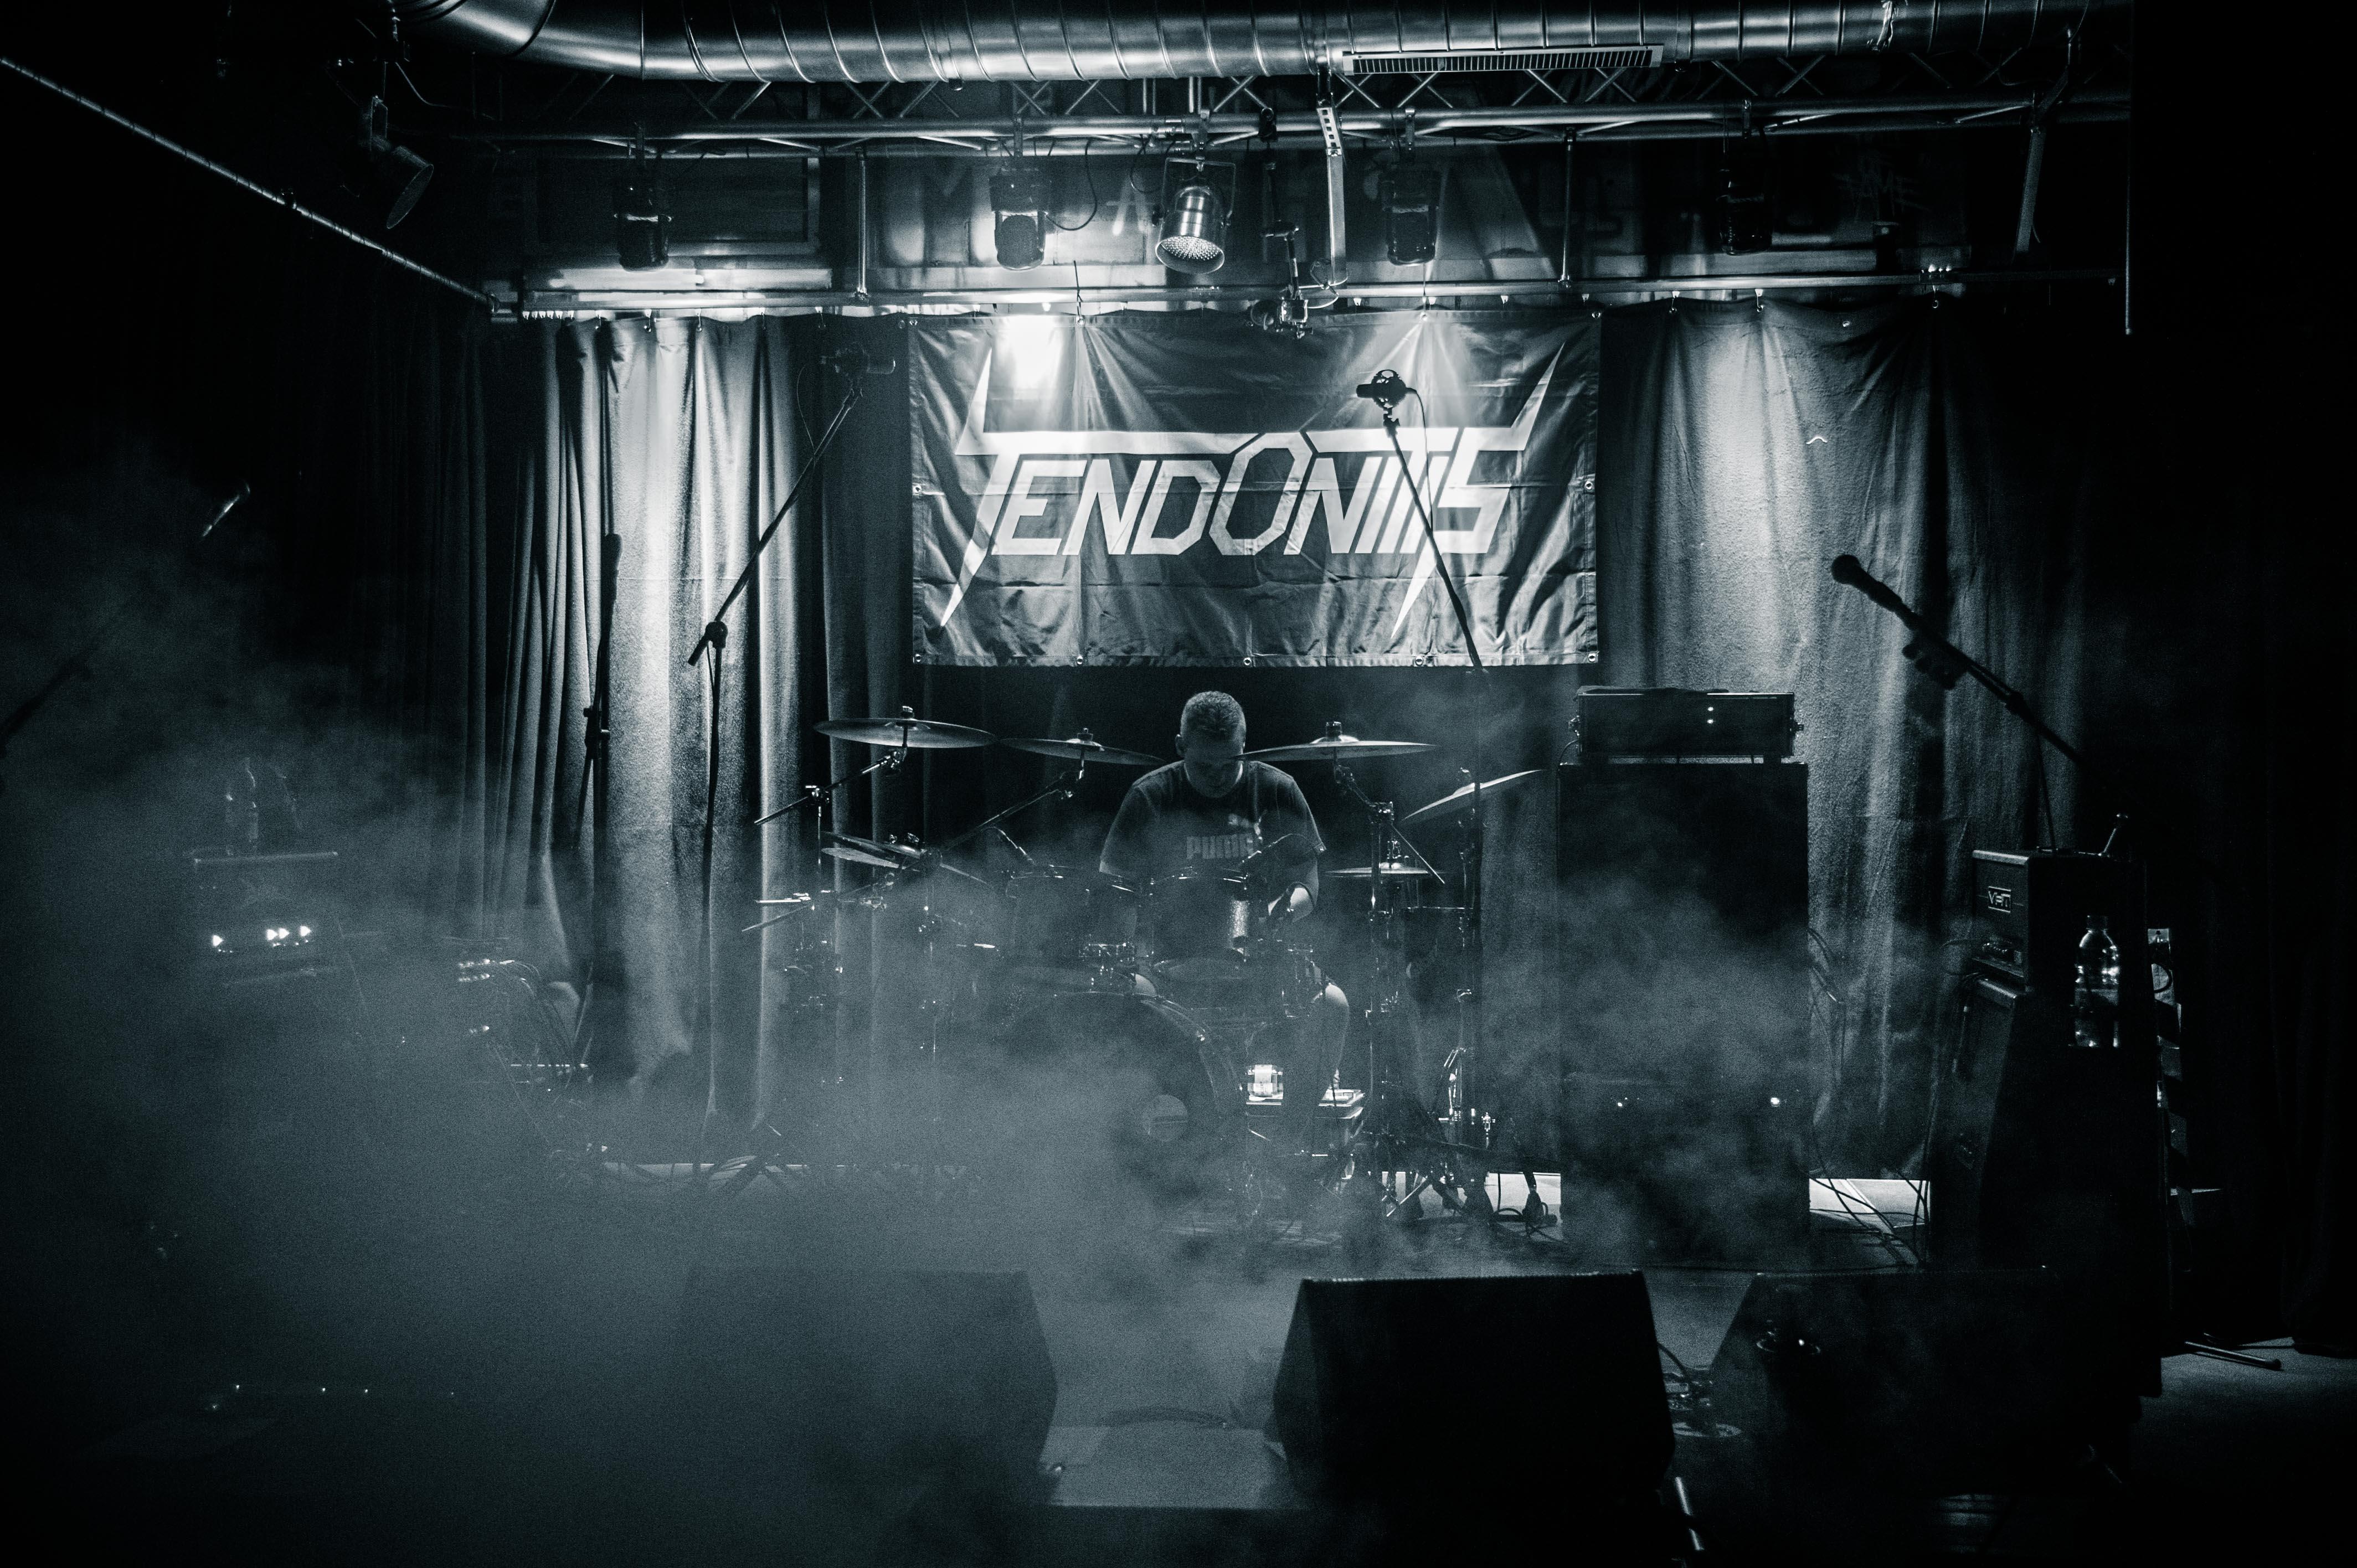 17_04_Tendonitis Fame Wetzikon-8